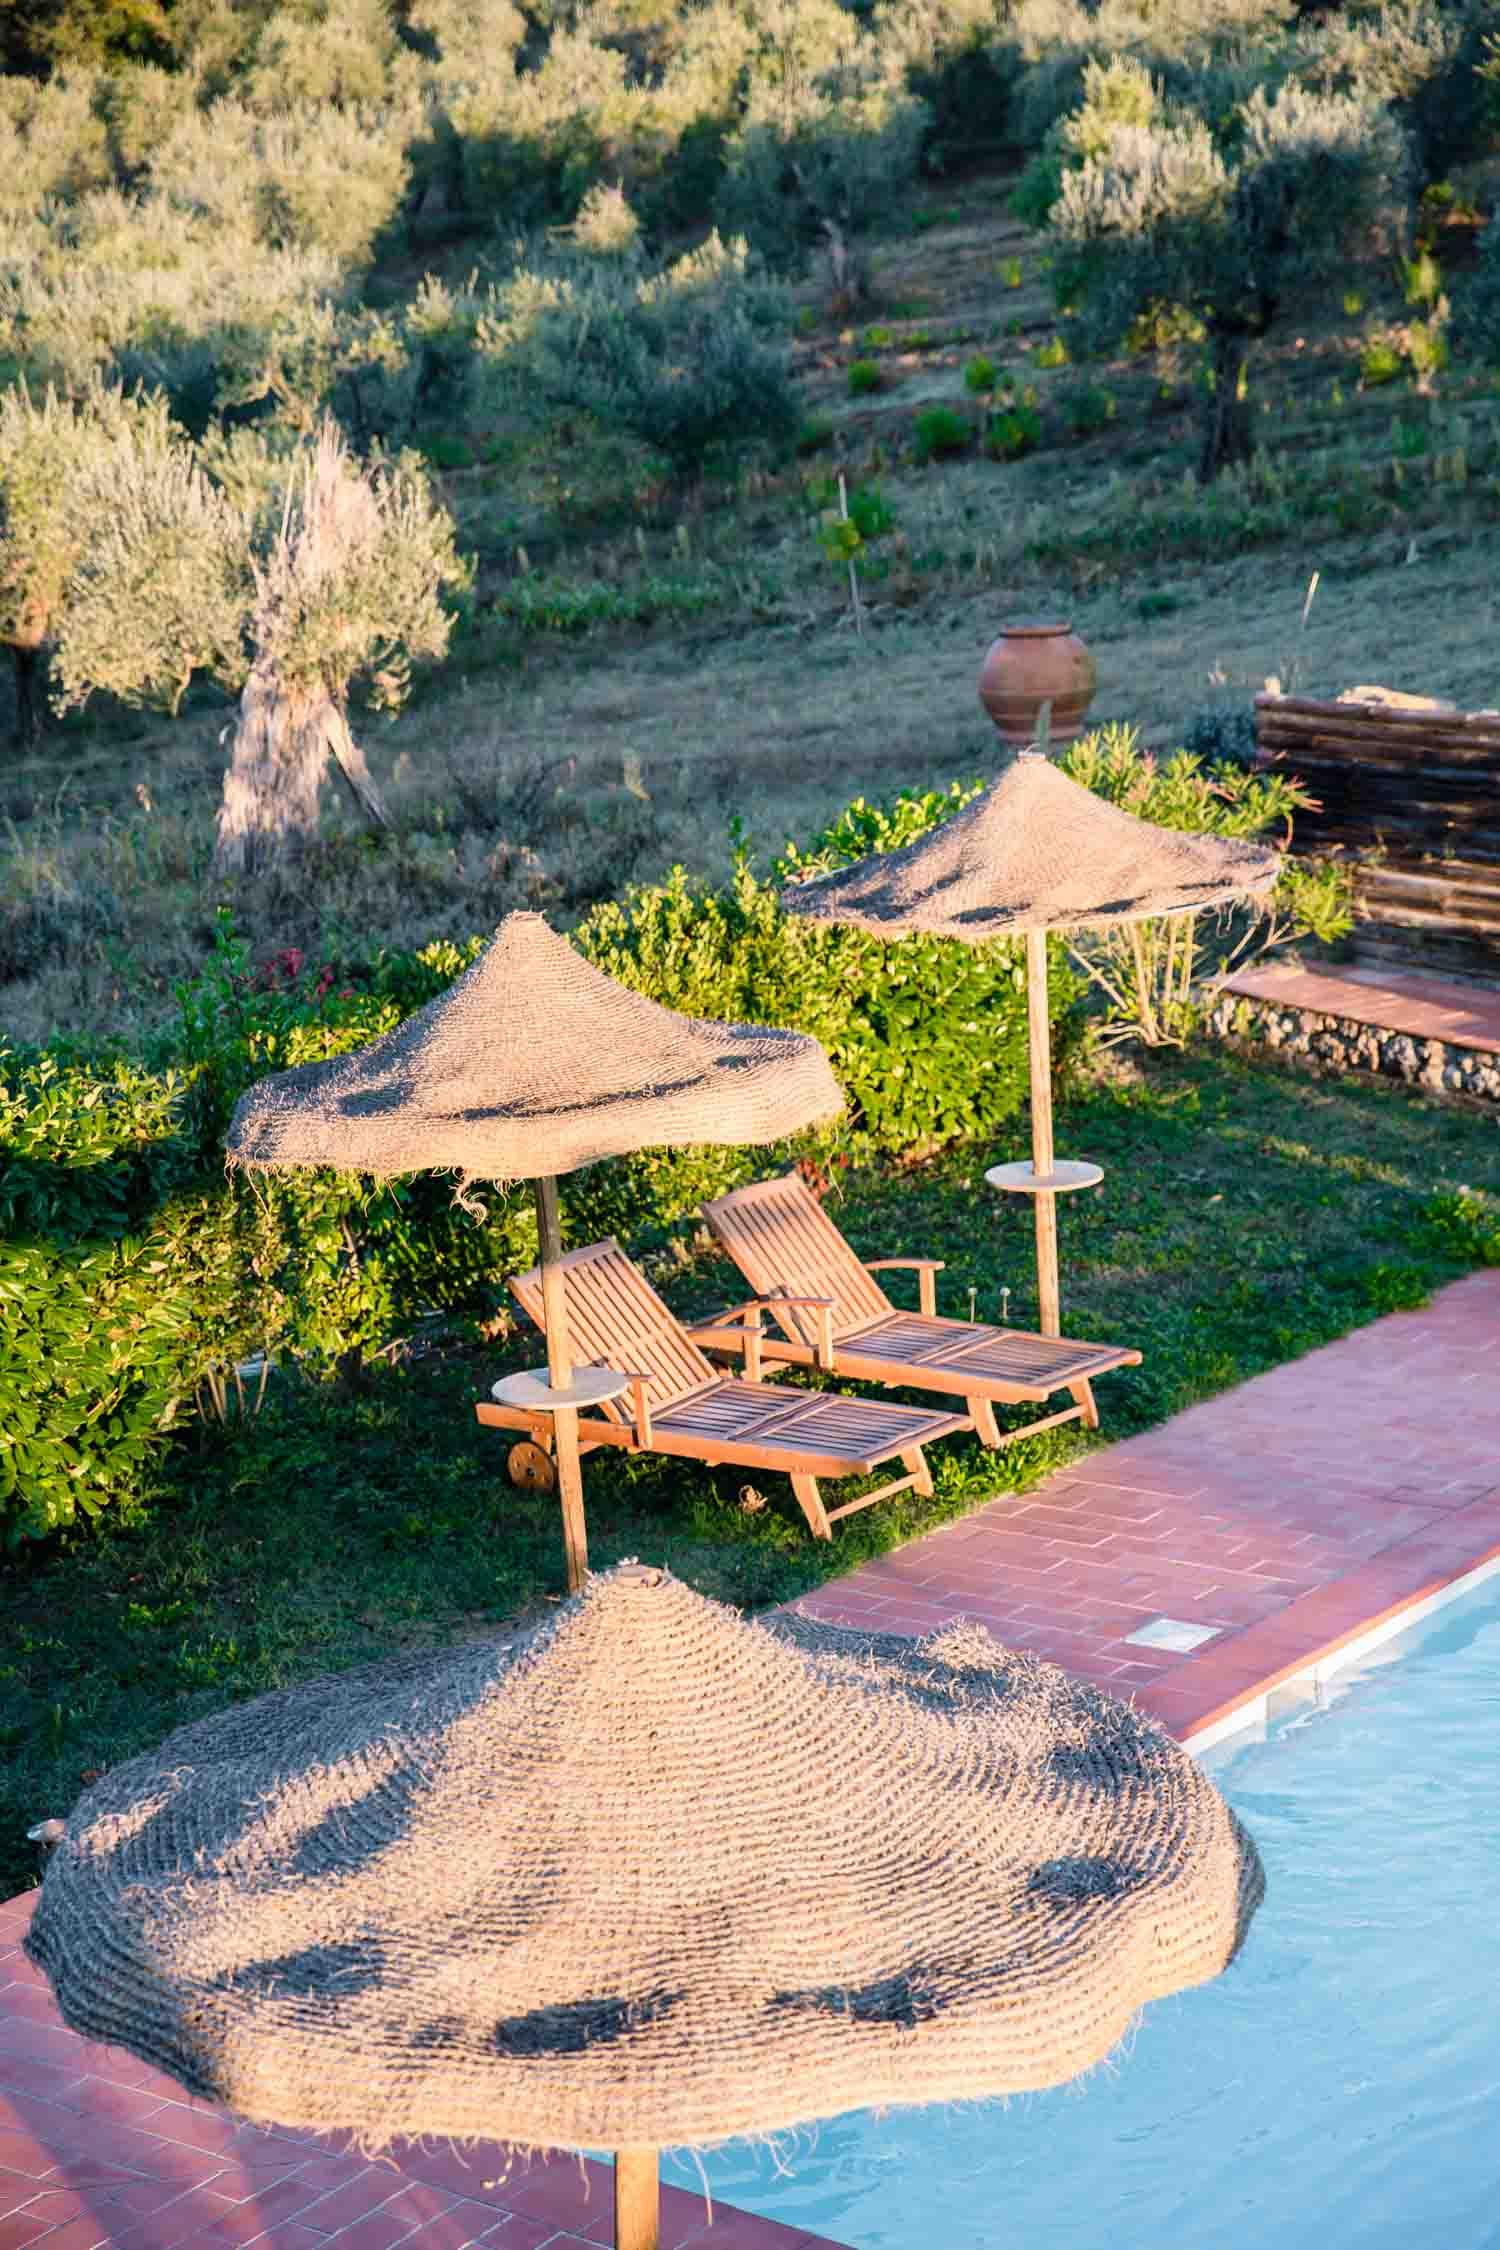 Olive grove and pool at i pini, the organic & vegan Italian farmhouse in Tuscany, Italy. #tuscany #travel #italy #italianfarmhouse #olivegroves #organicoliveoil #vineyards #italyinautumn #veganrestaurant #vegantravel #italytravel #veganitaly #vegantuscany #veganhotel #ecotourism #organichotel #veganhotel #veganretreat #veganbedandbreakfast #sangimignano